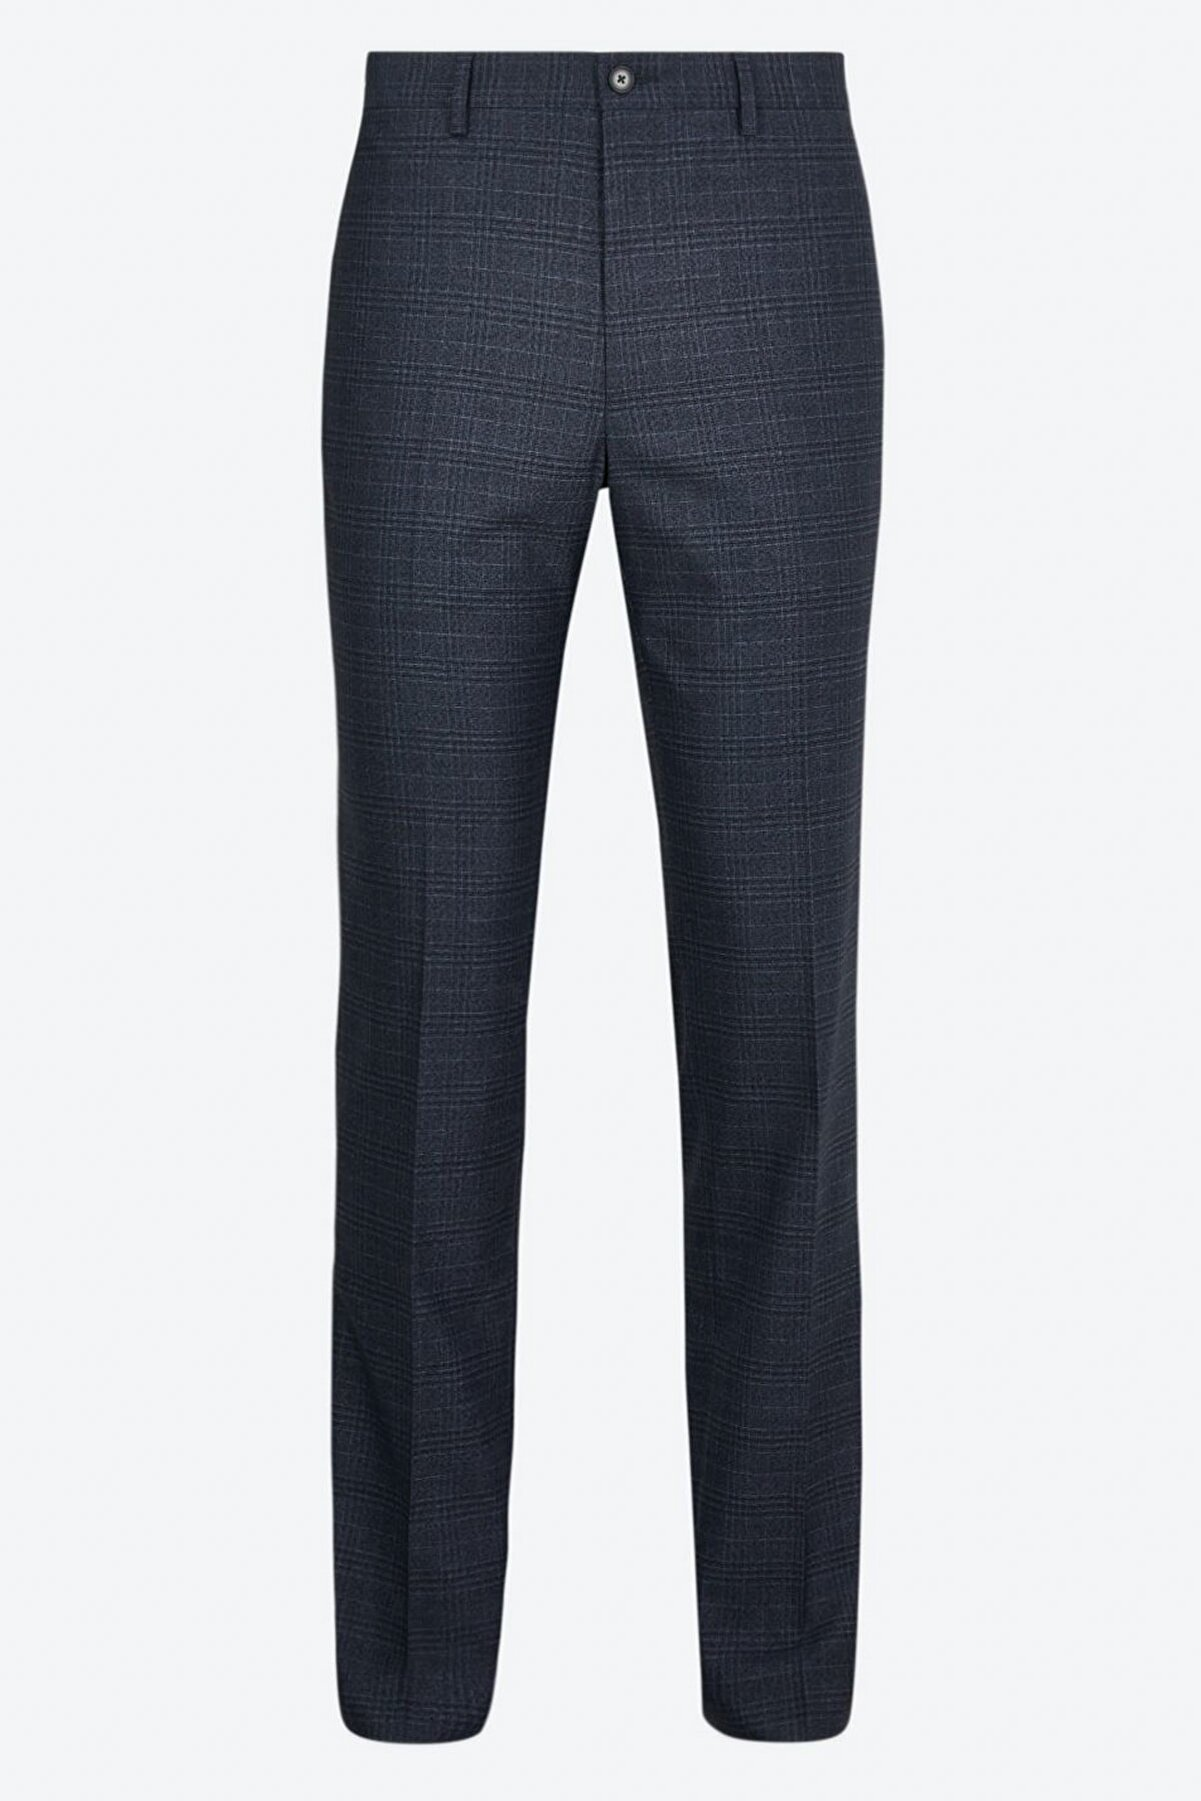 Marks & Spencer Erkek Mavi Slim Fit Streç Ekose Pantolon T18004240F